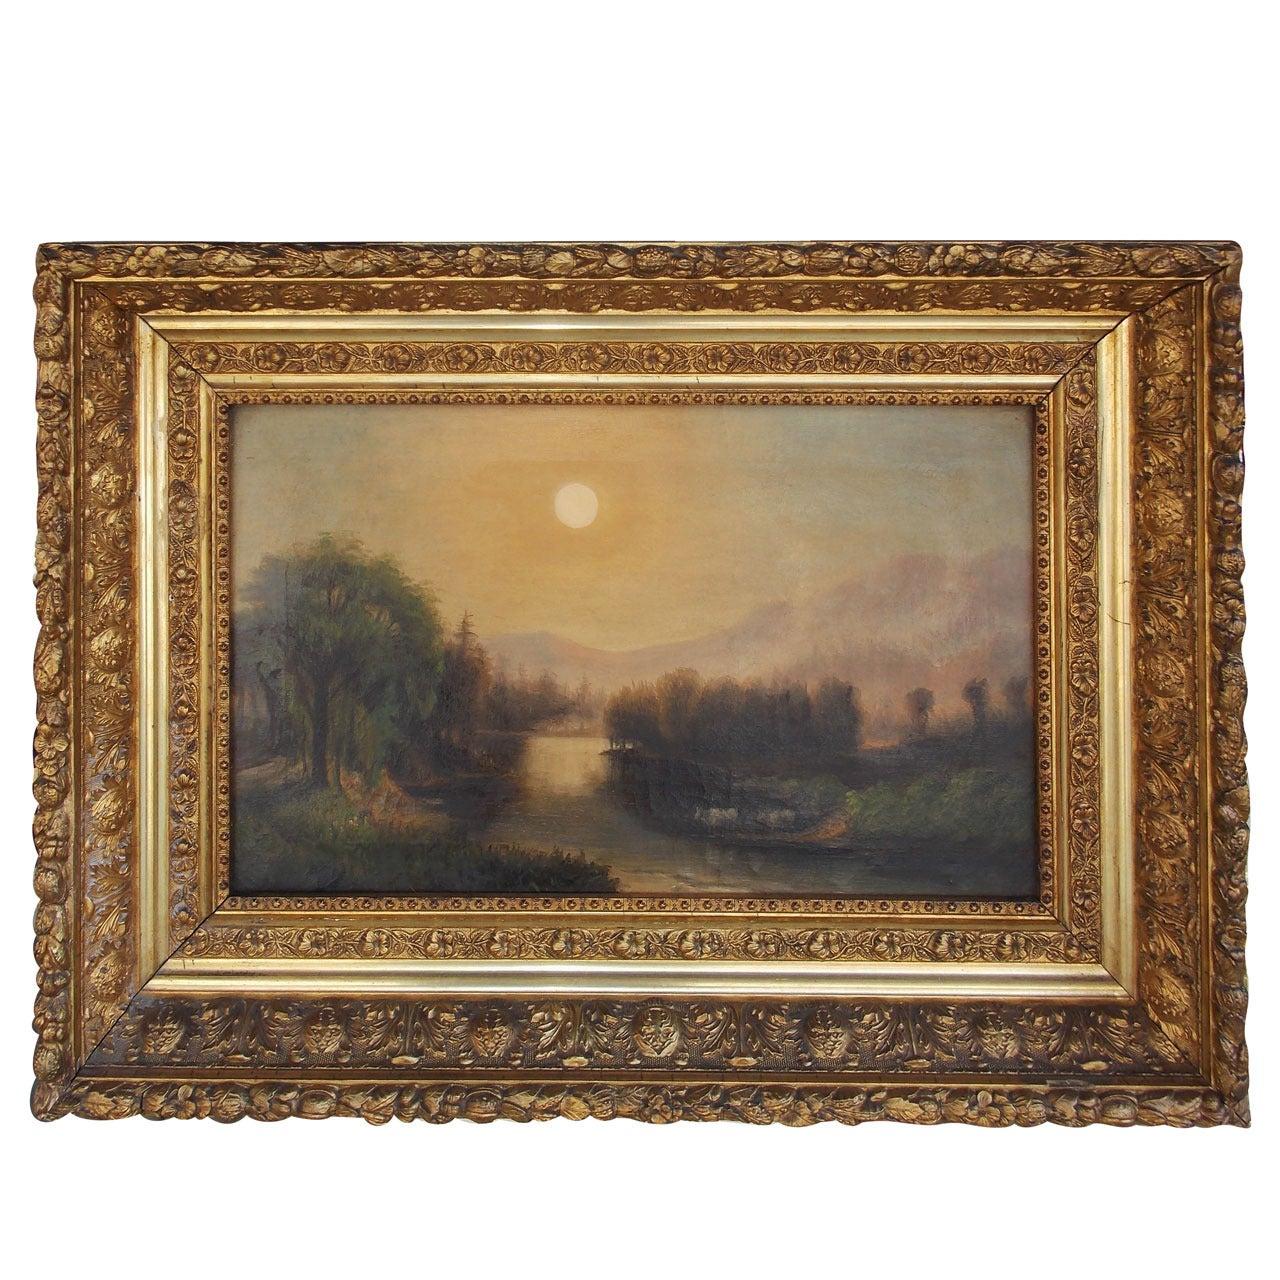 American Oil on Canvas Landscape in the Original Floral Gilt Frame. Circa 1850